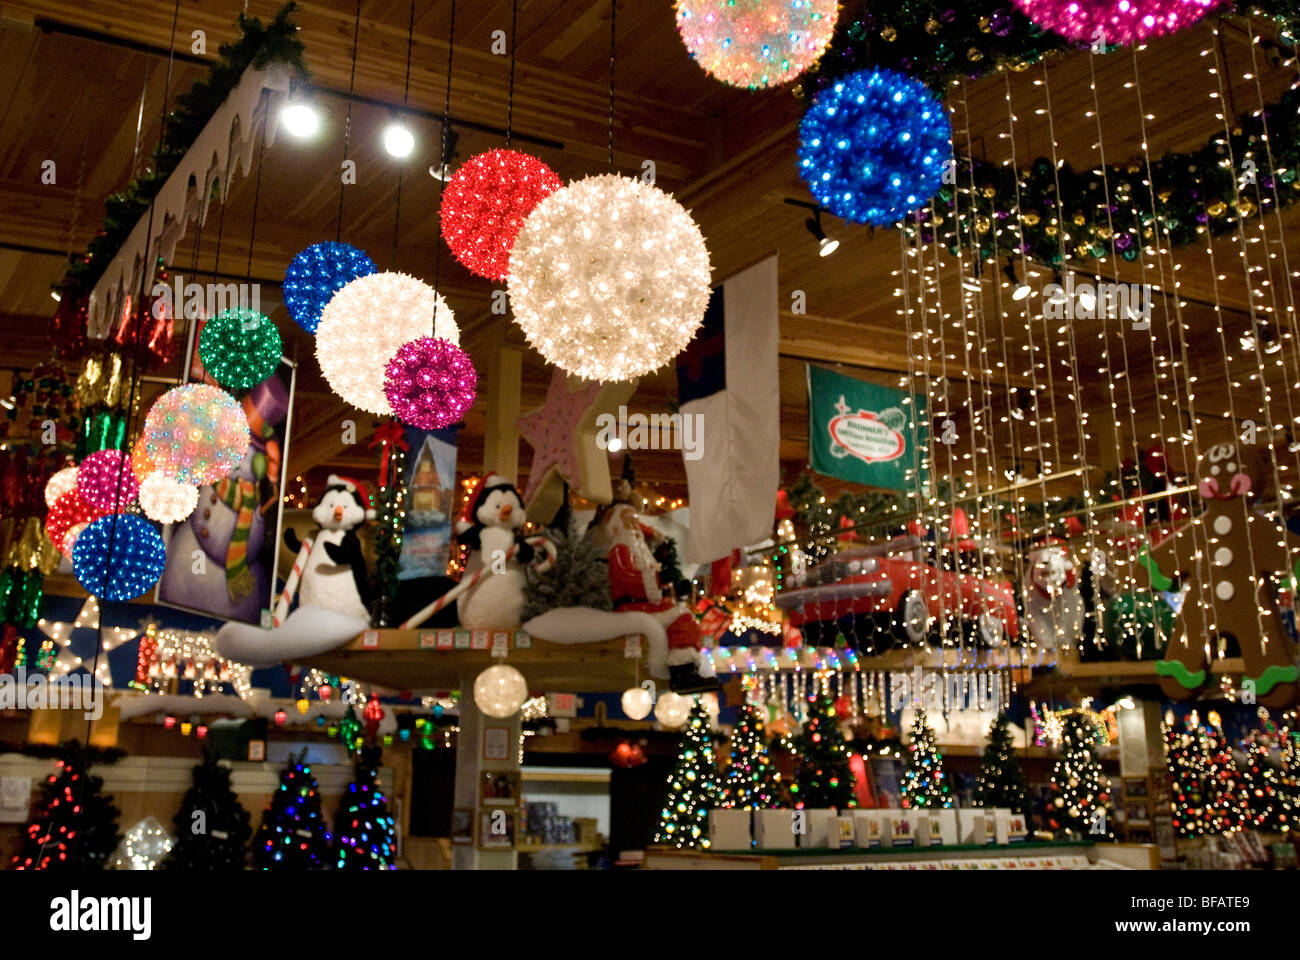 Bronners Christmas Wonderland.Bronner S Christmas Wonderland Frankenmuth Michigan